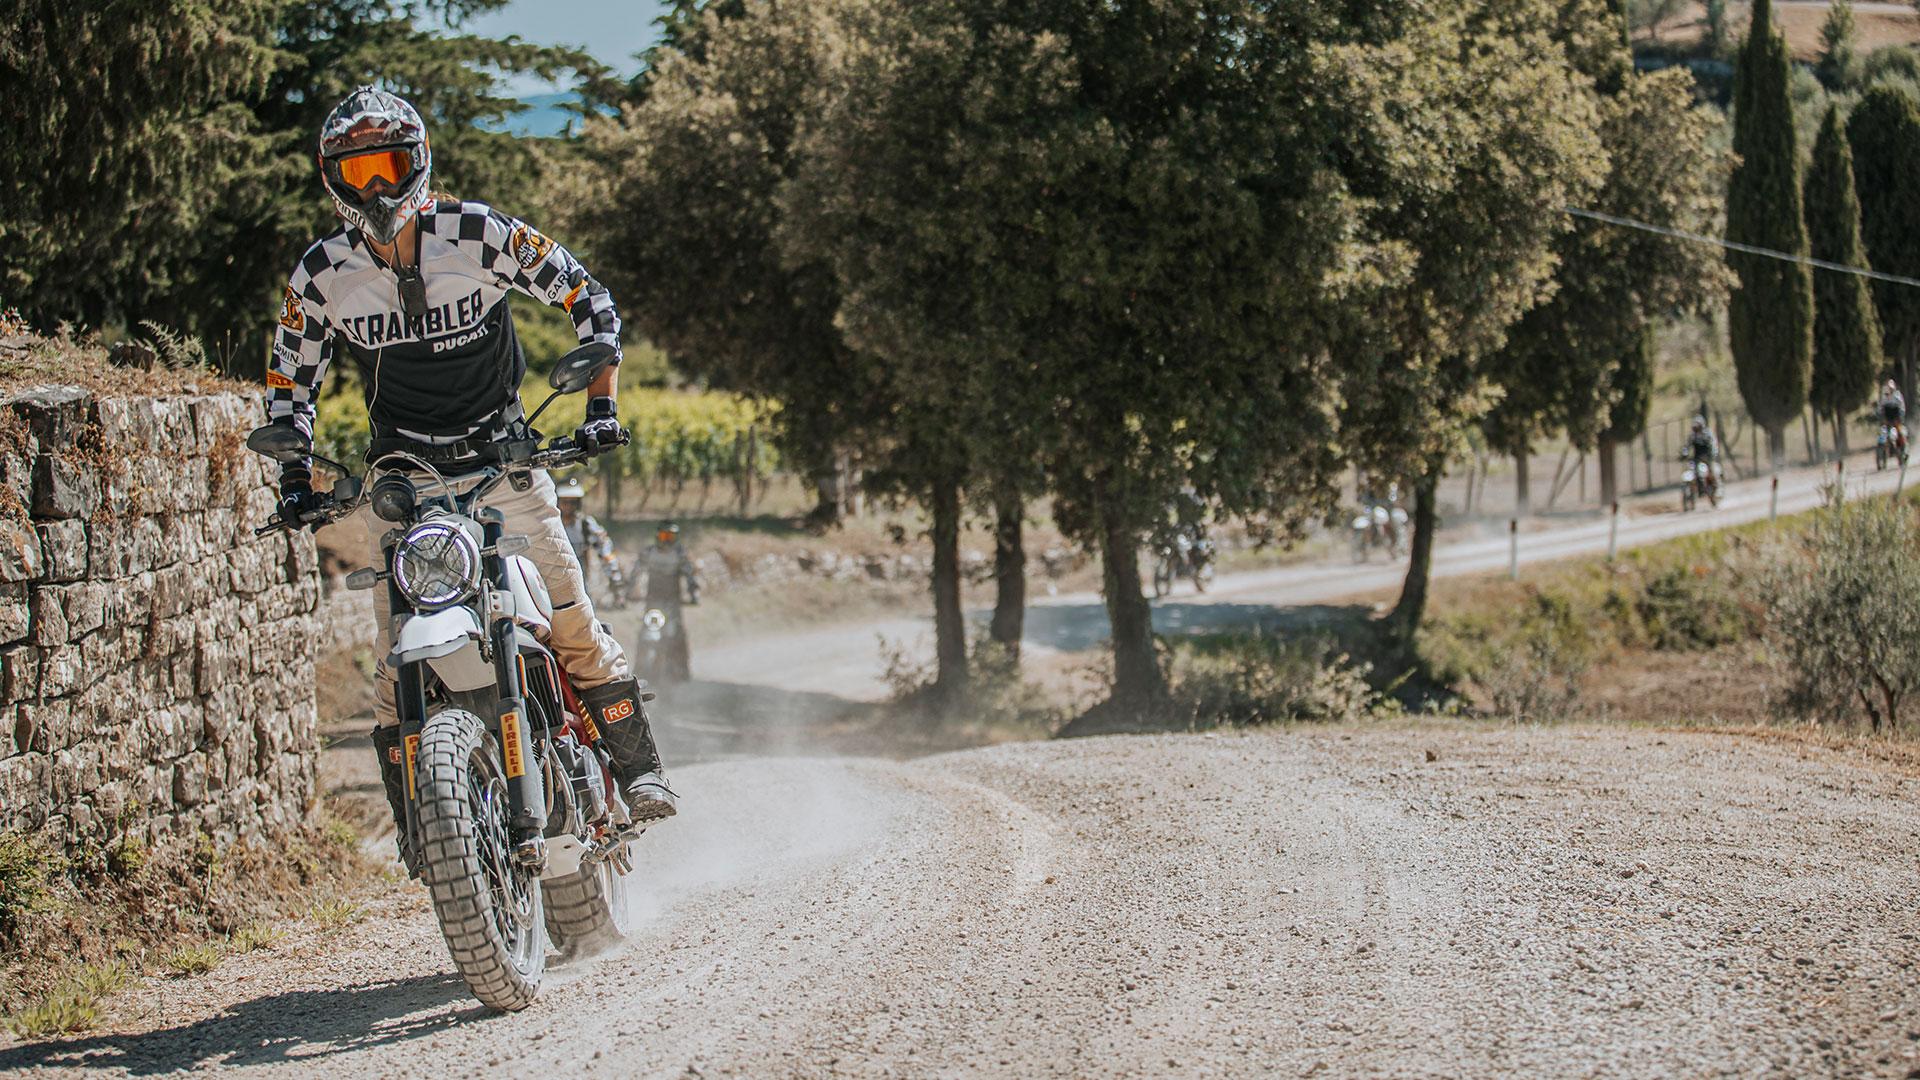 Ducati Scrambler Days of Joy